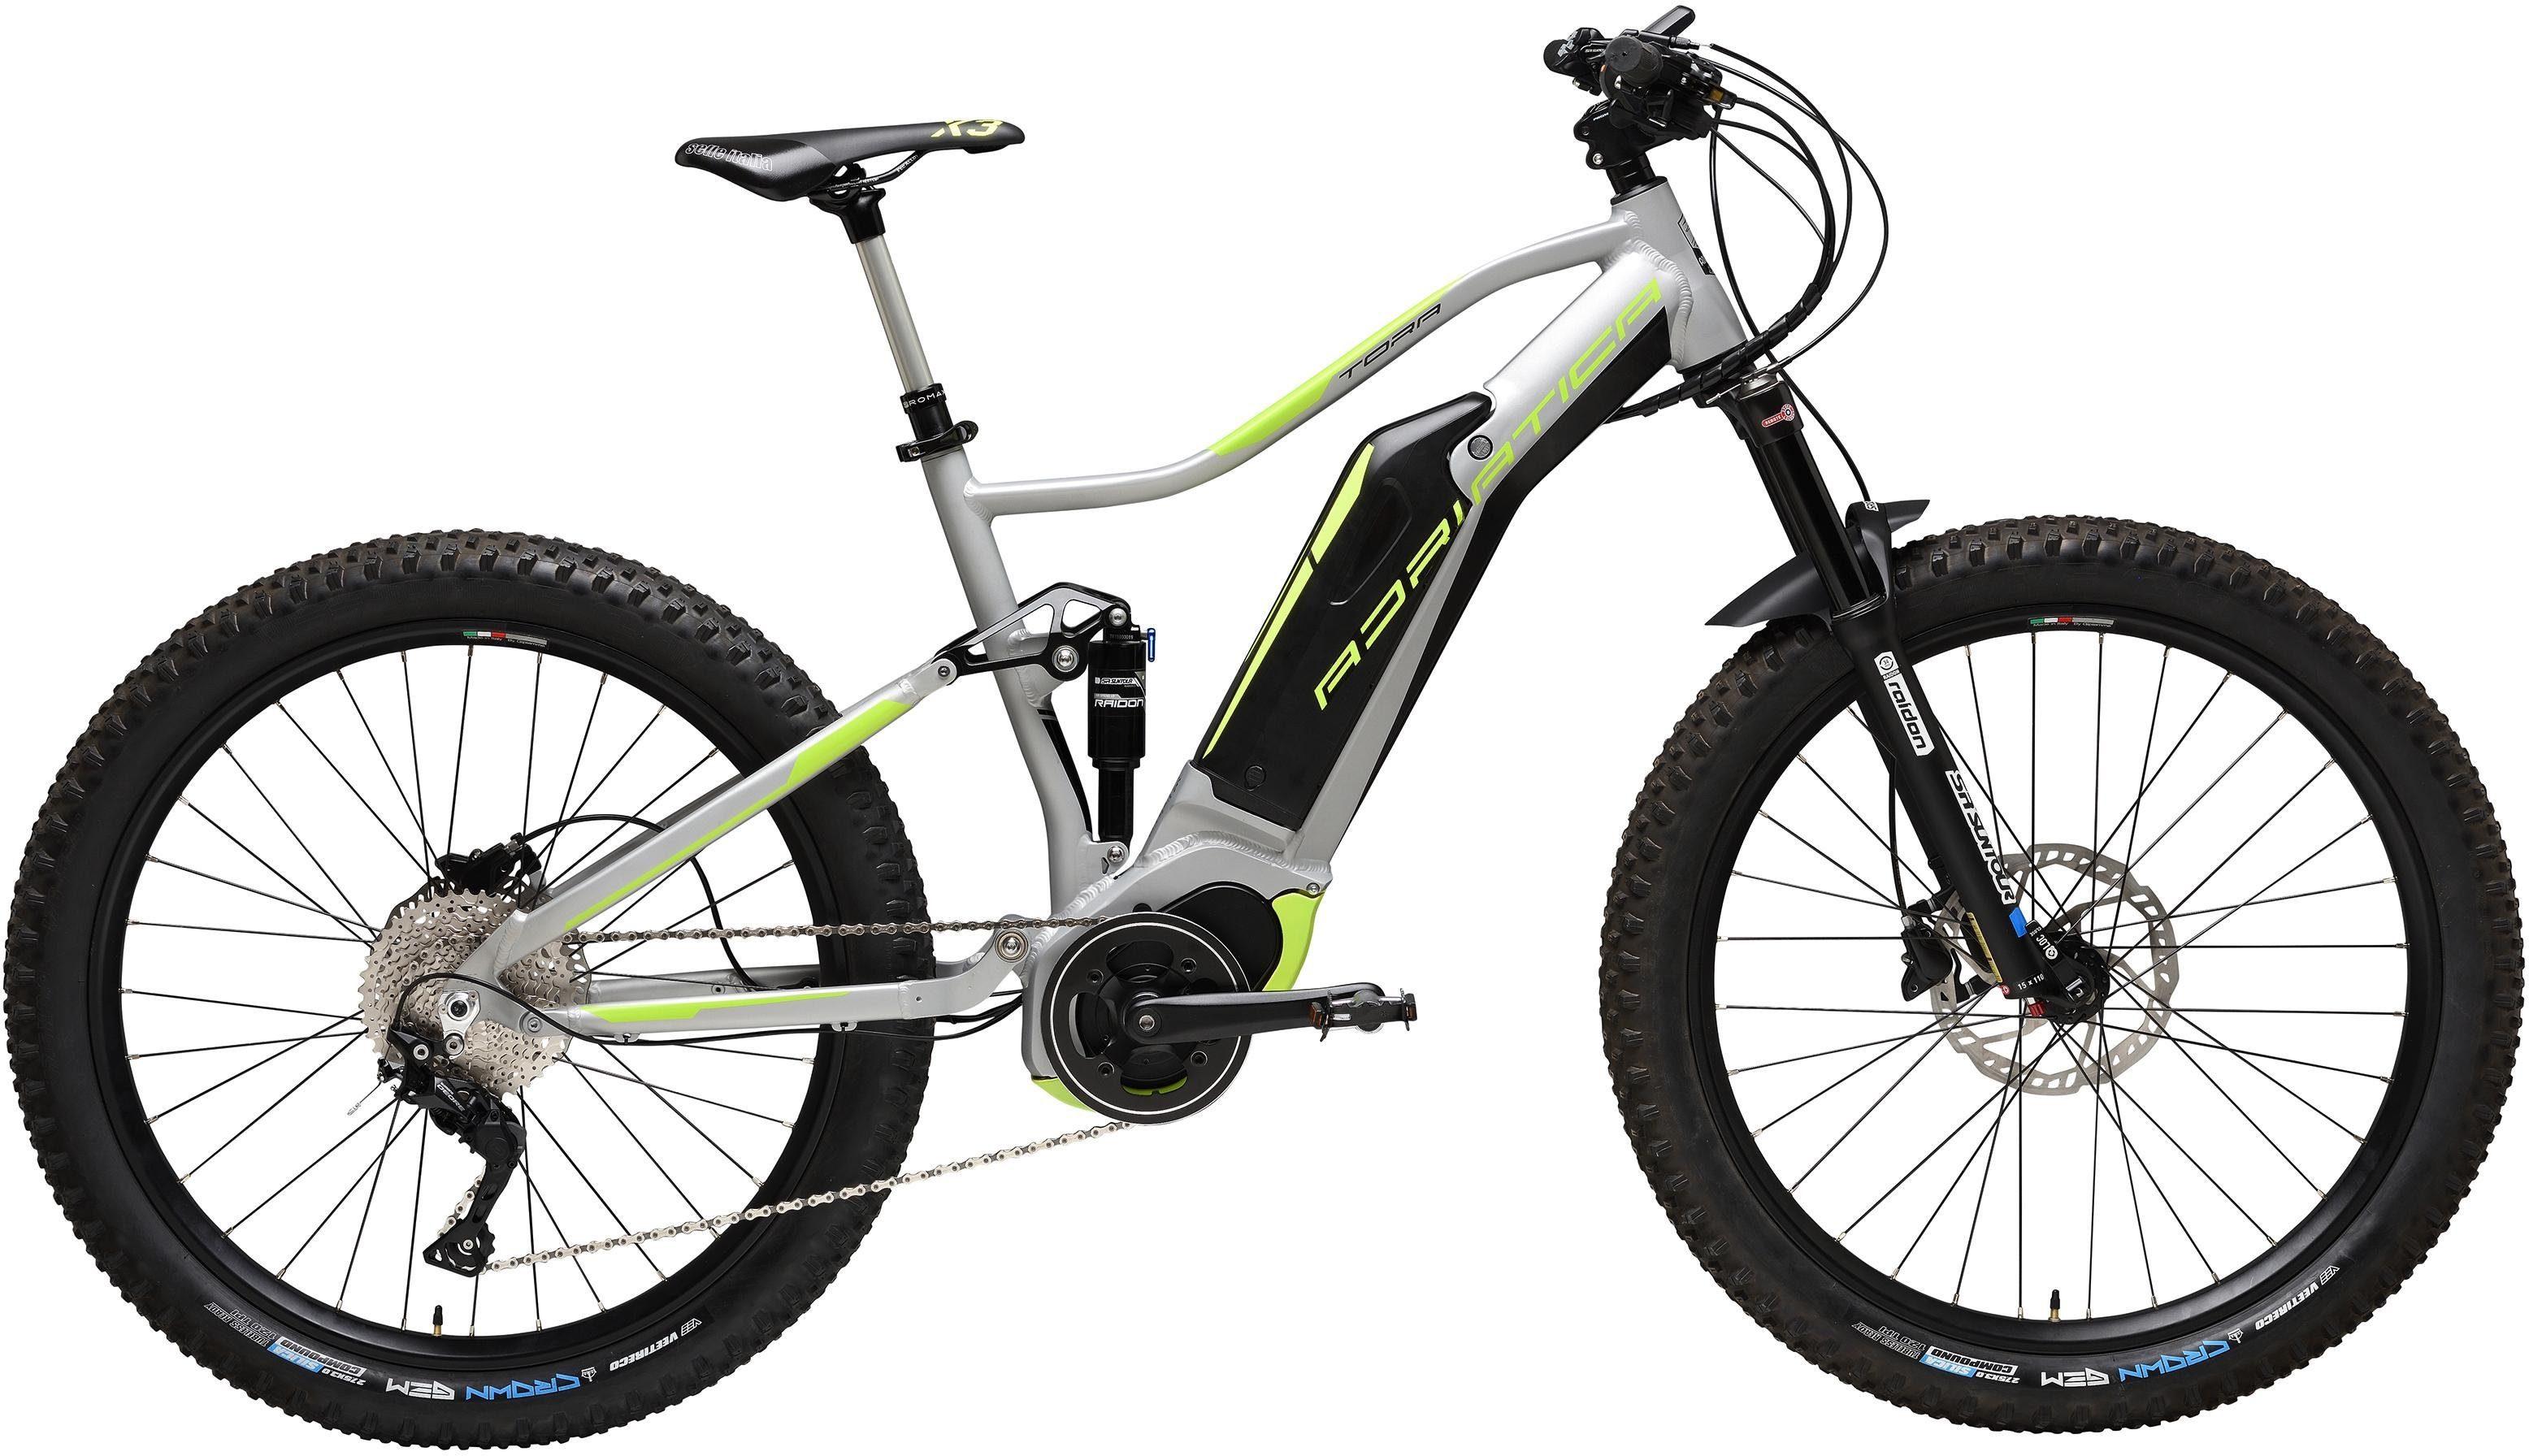 Adriatica E-Bike »TORA«, 10 Gang Shimano DEORE RDM 6000 Schaltwerk, Kettenschaltung, Mittelmotor 250 W